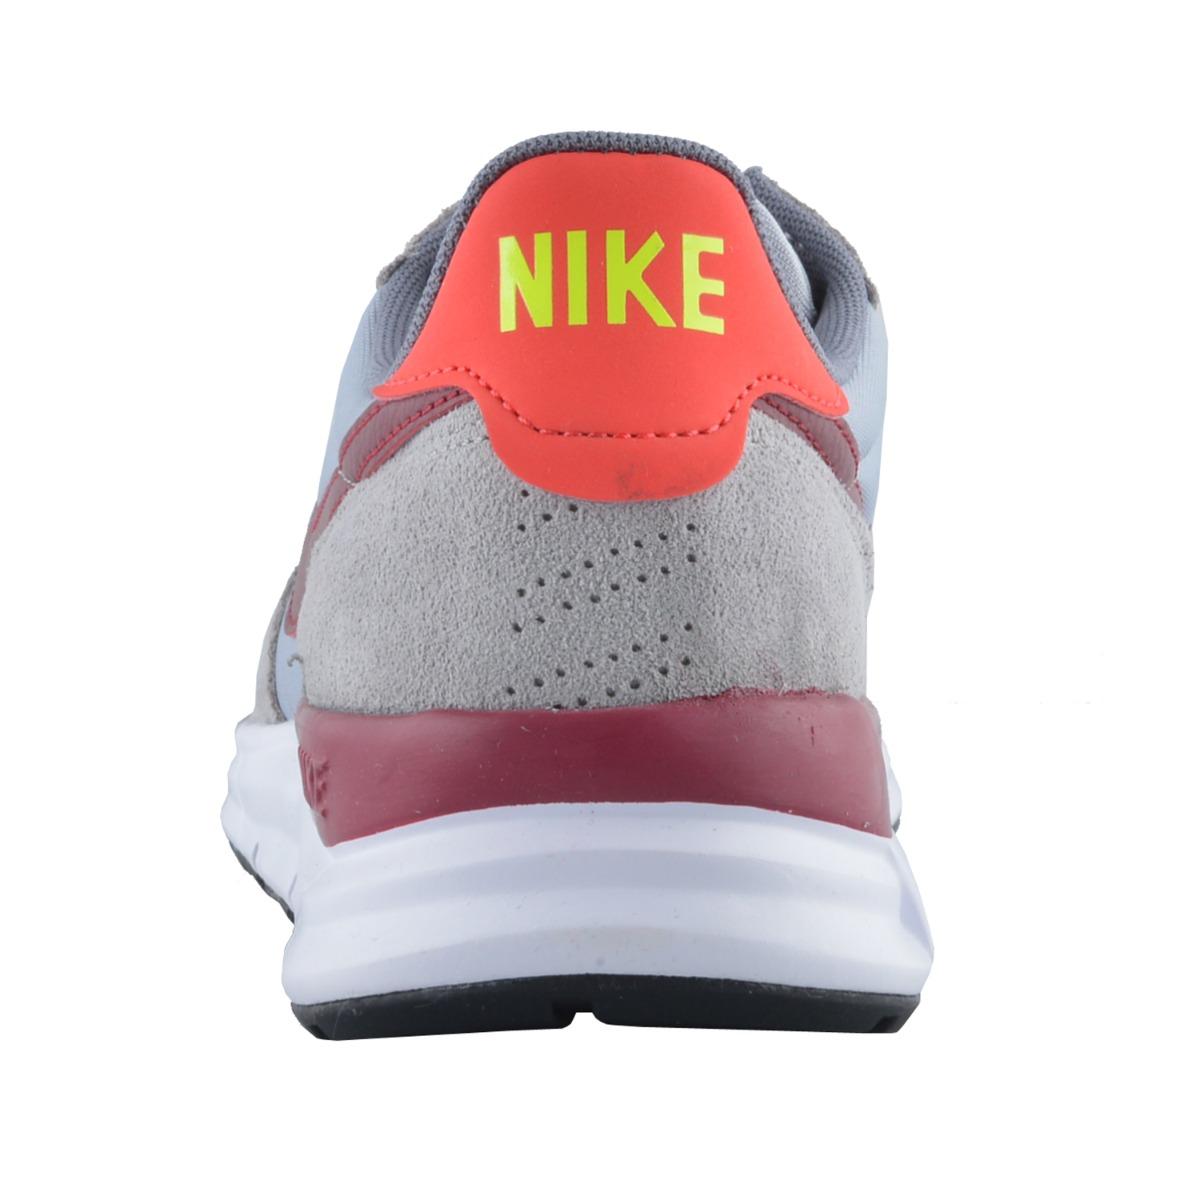 nike xccelerator tr à vendre - Nike Men's Lunar Internationalist Wolf Grey/Red Suede Running ...